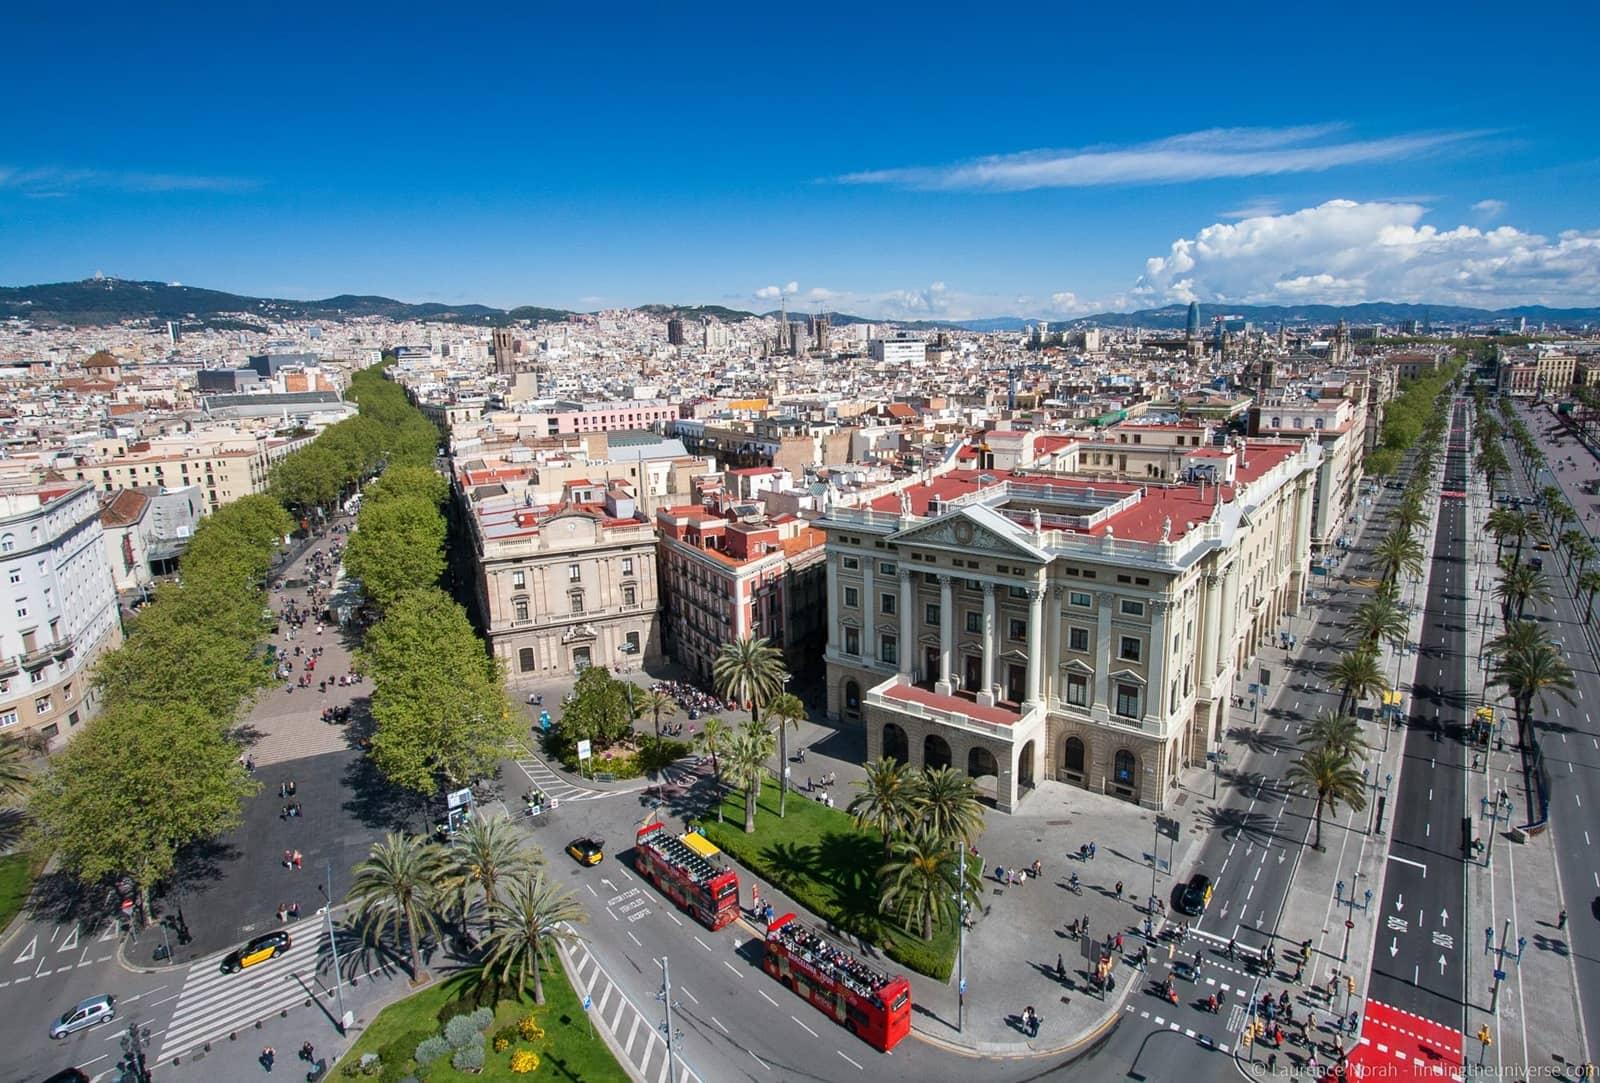 [Las+Ramblas+Barcelona_by_Laurence+Norah%5B4%5D]